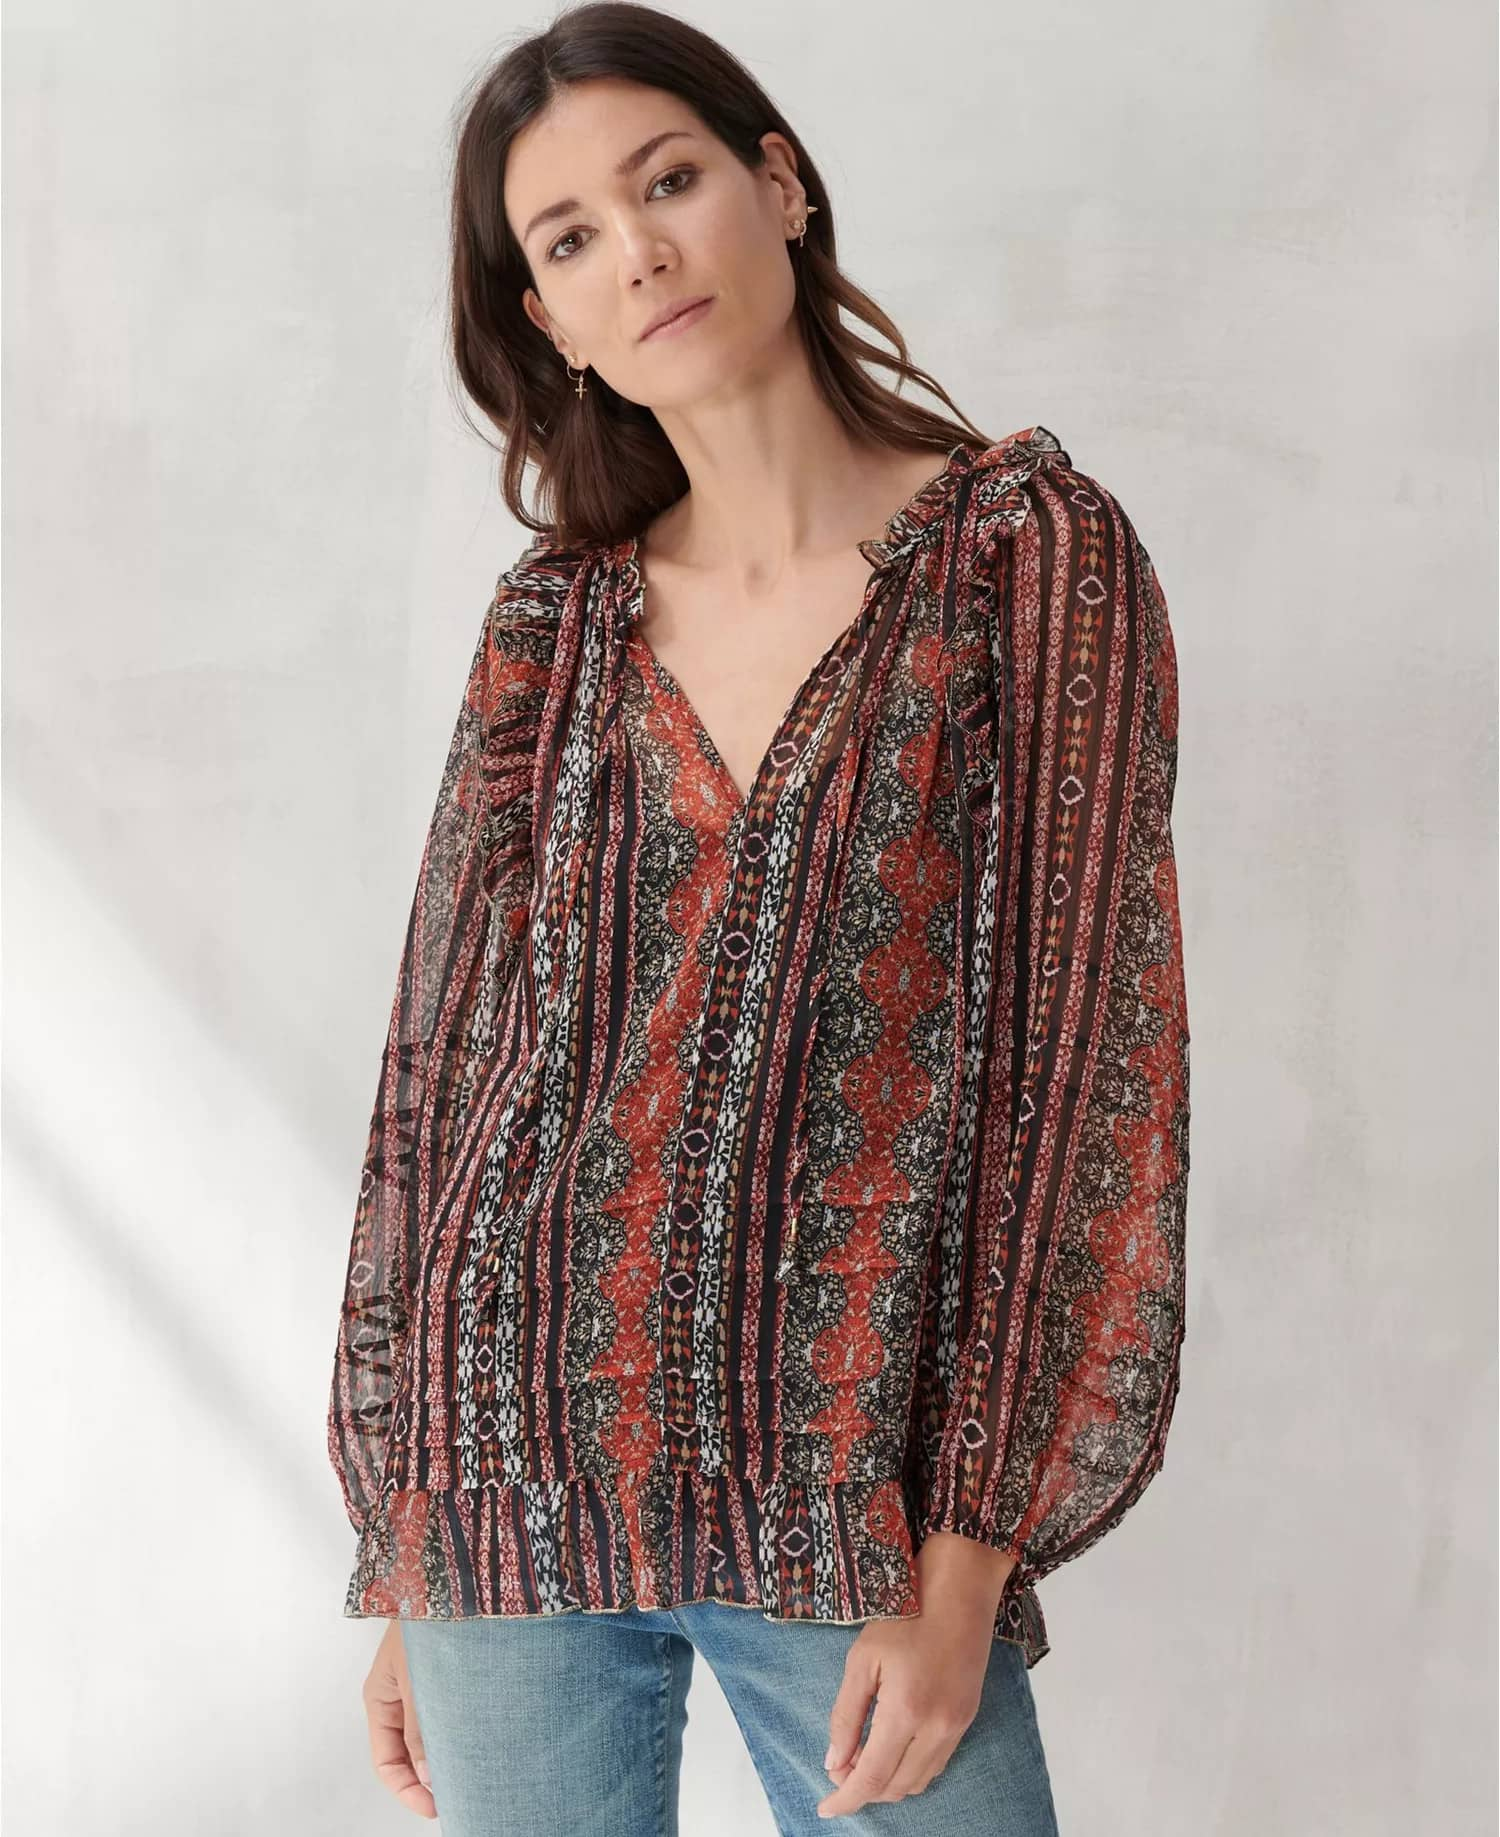 Lucky Brand Women's Chiffon Printed Peasant Top